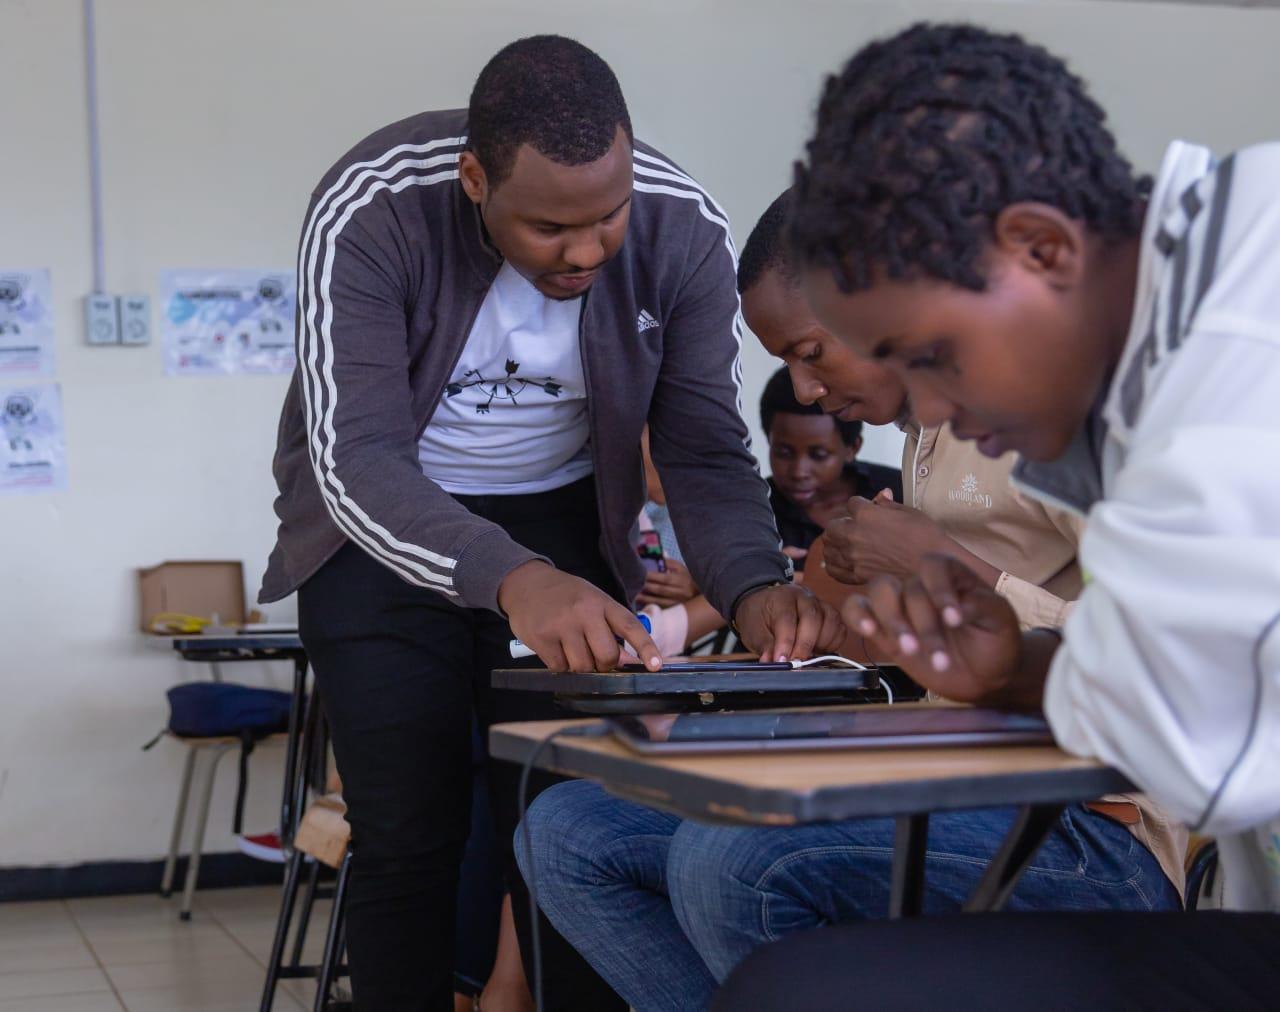 Collecting-Kinyarwanda-Voice-Data-Sets-in-a-workshop-with-Digital-Umuganda